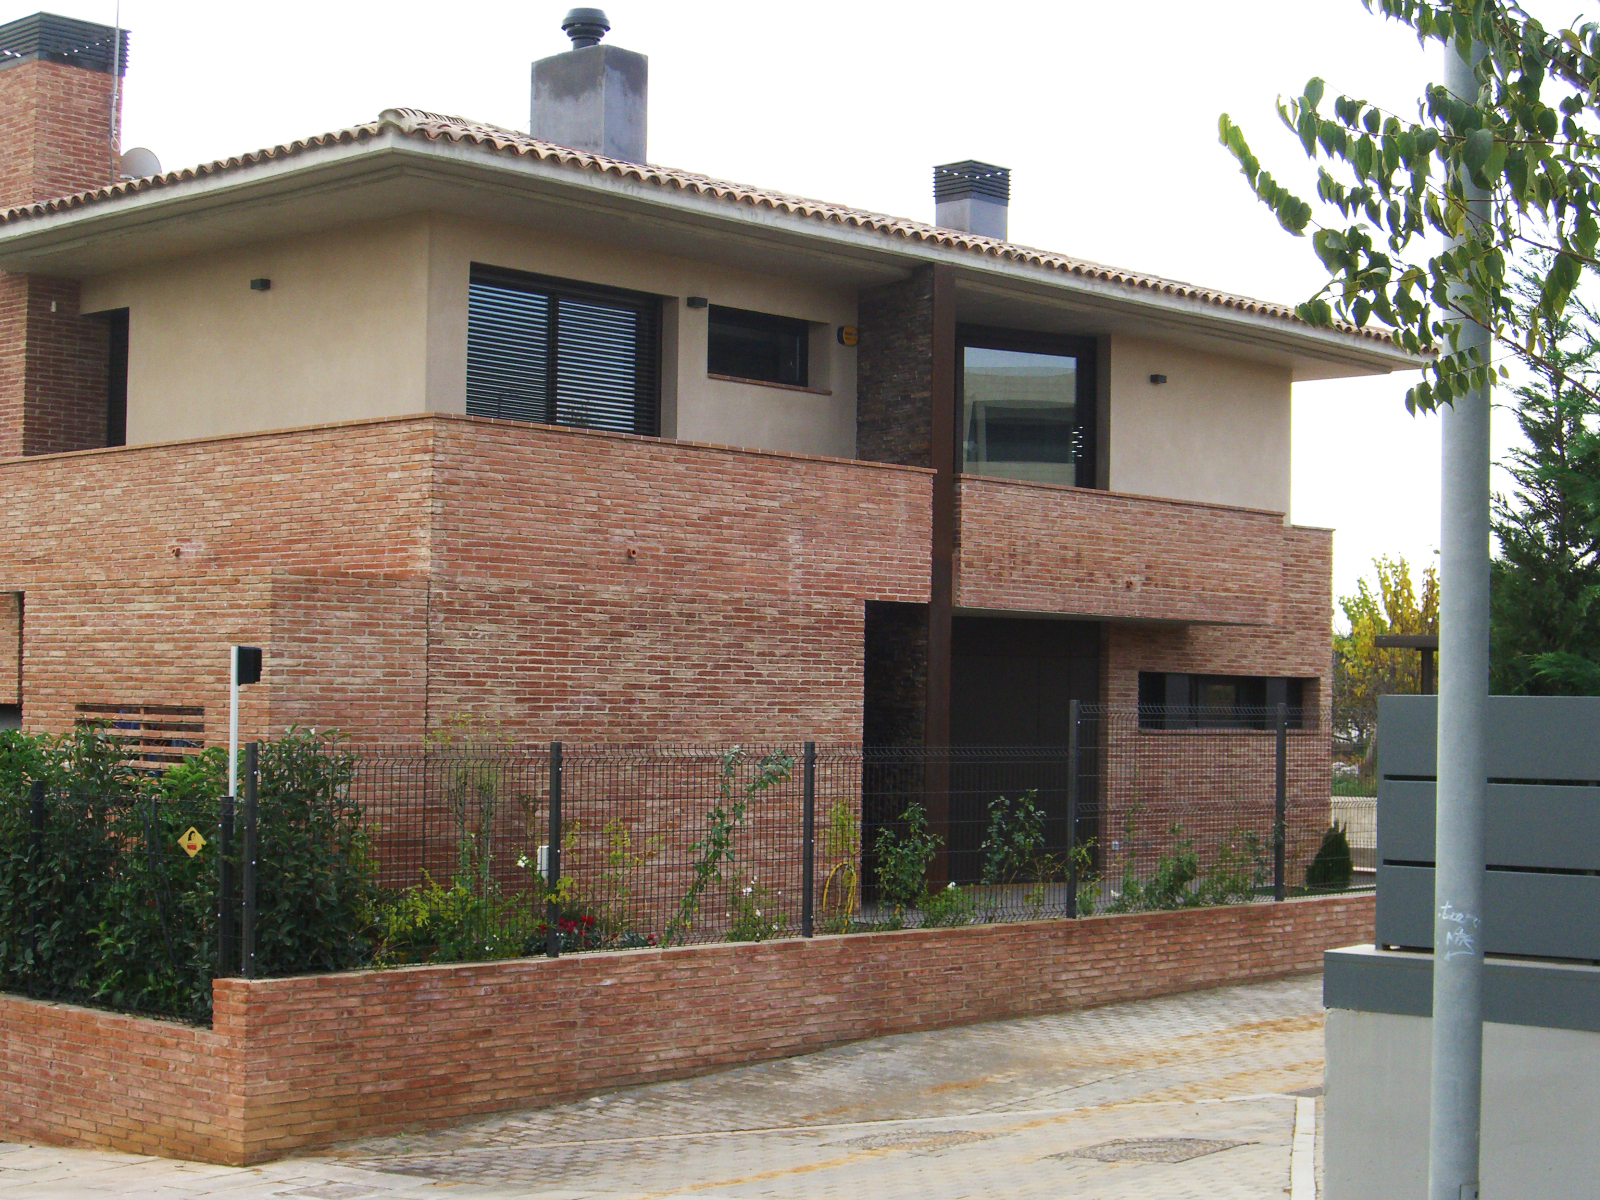 https://plaat.es/wp-content/uploads/2020/12/Sant-Cugat-II_retocada-1.jpg